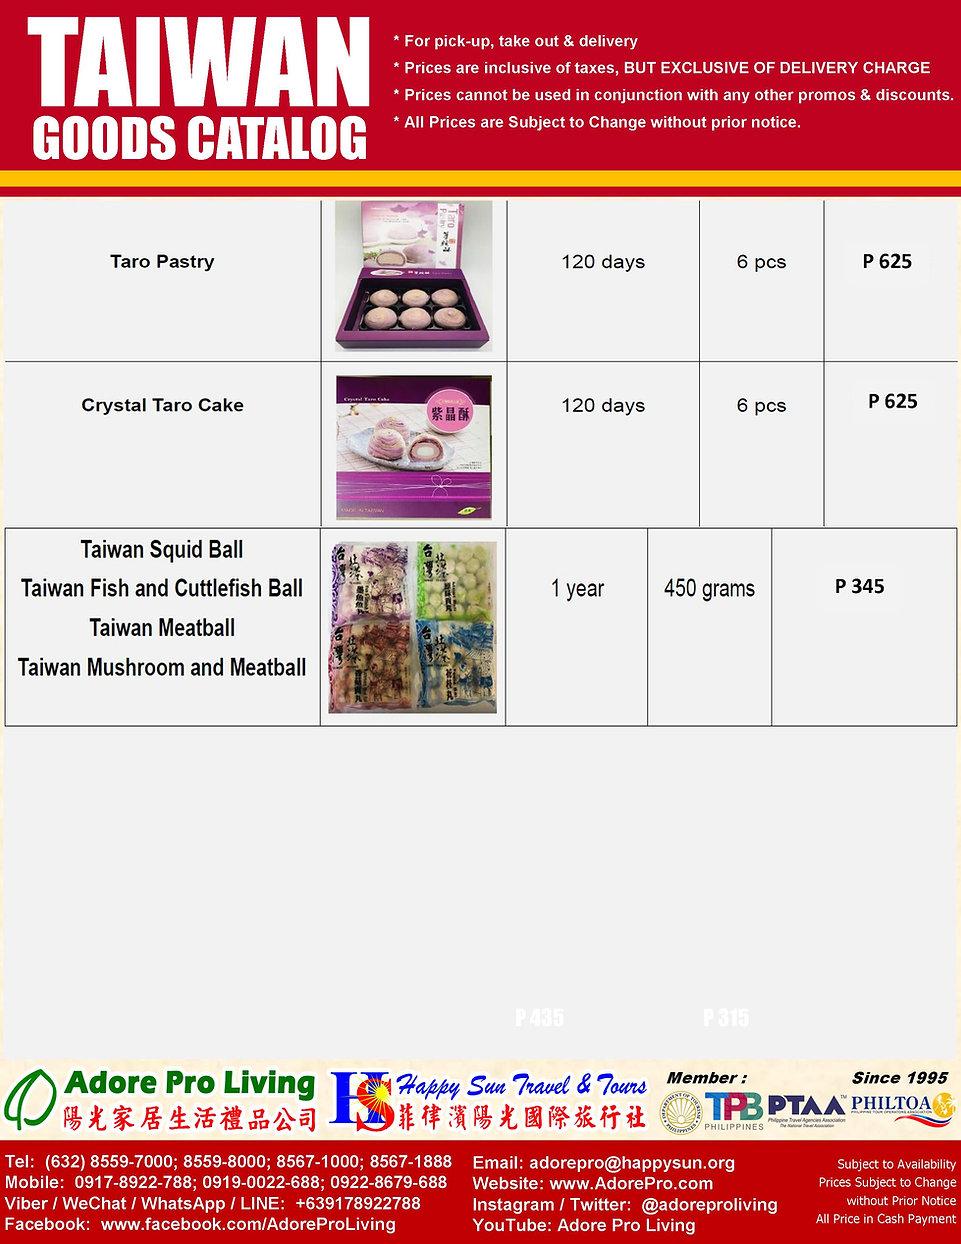 P26_Taiwan Goods Catalog_20201001.jpg